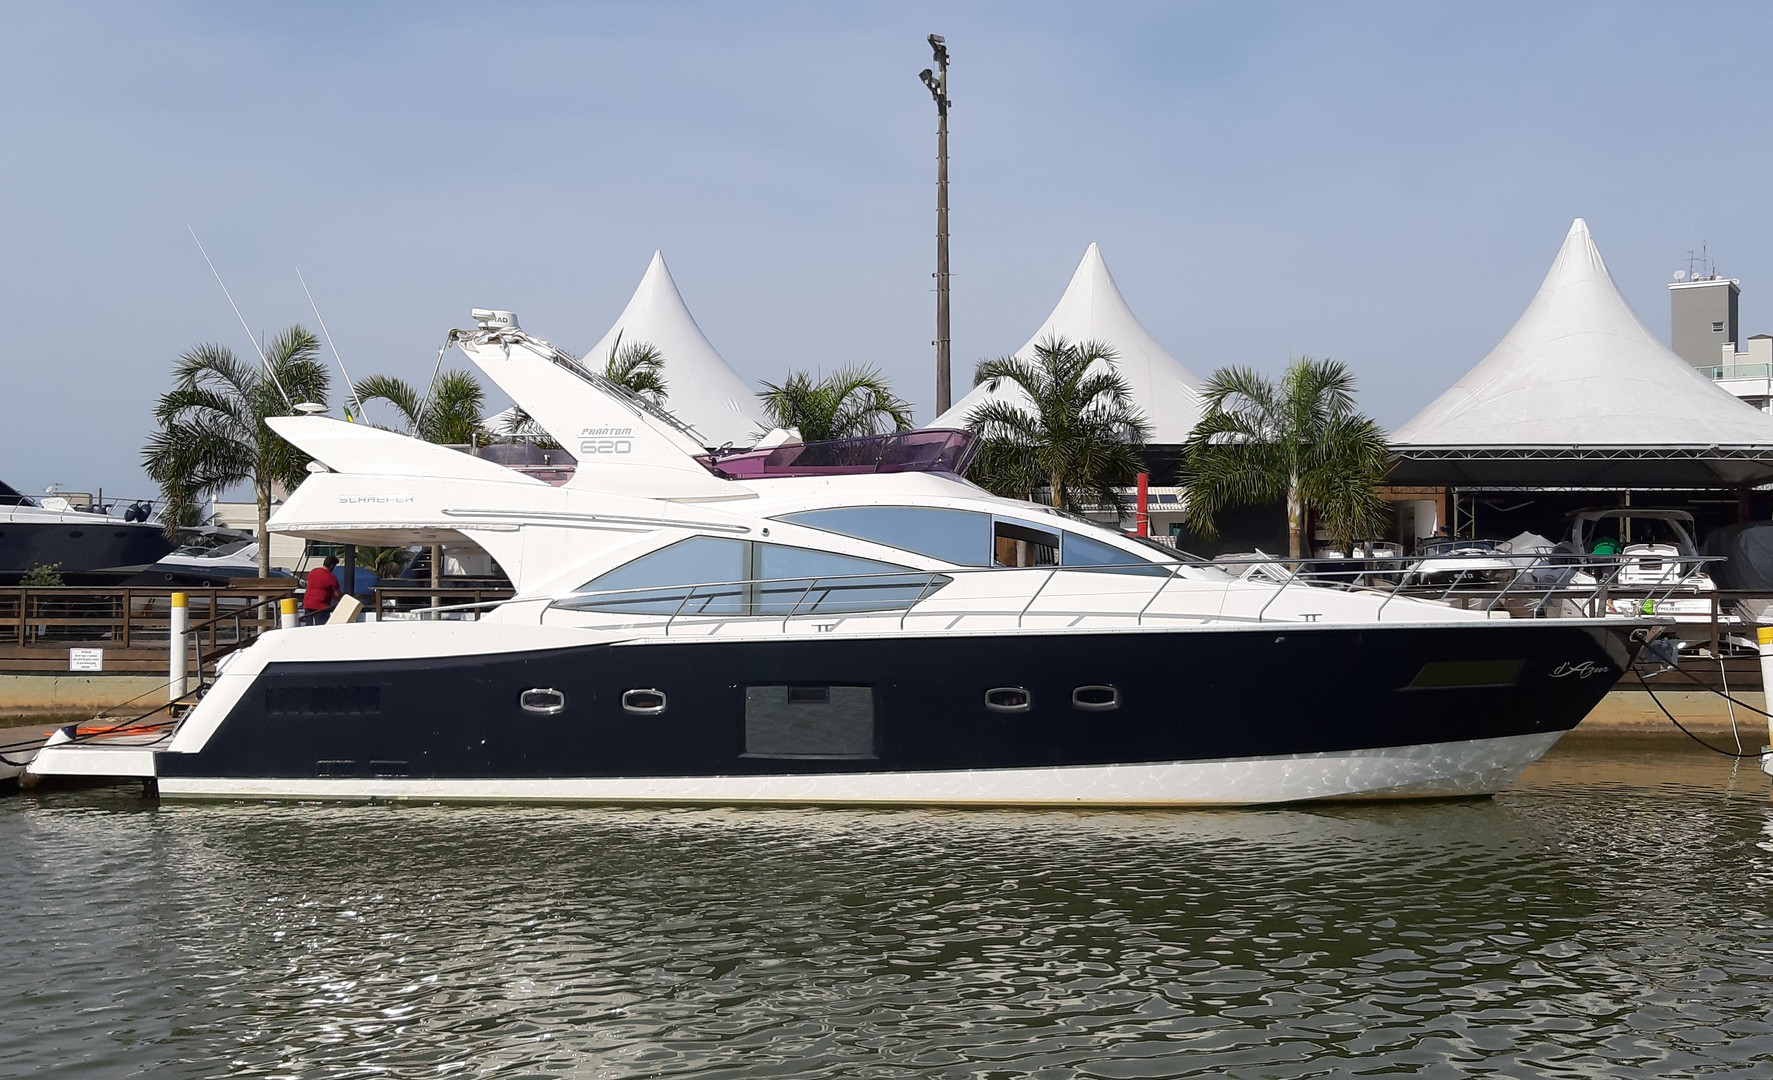 Schaefer Yachts - Phantom 620 ano 2012